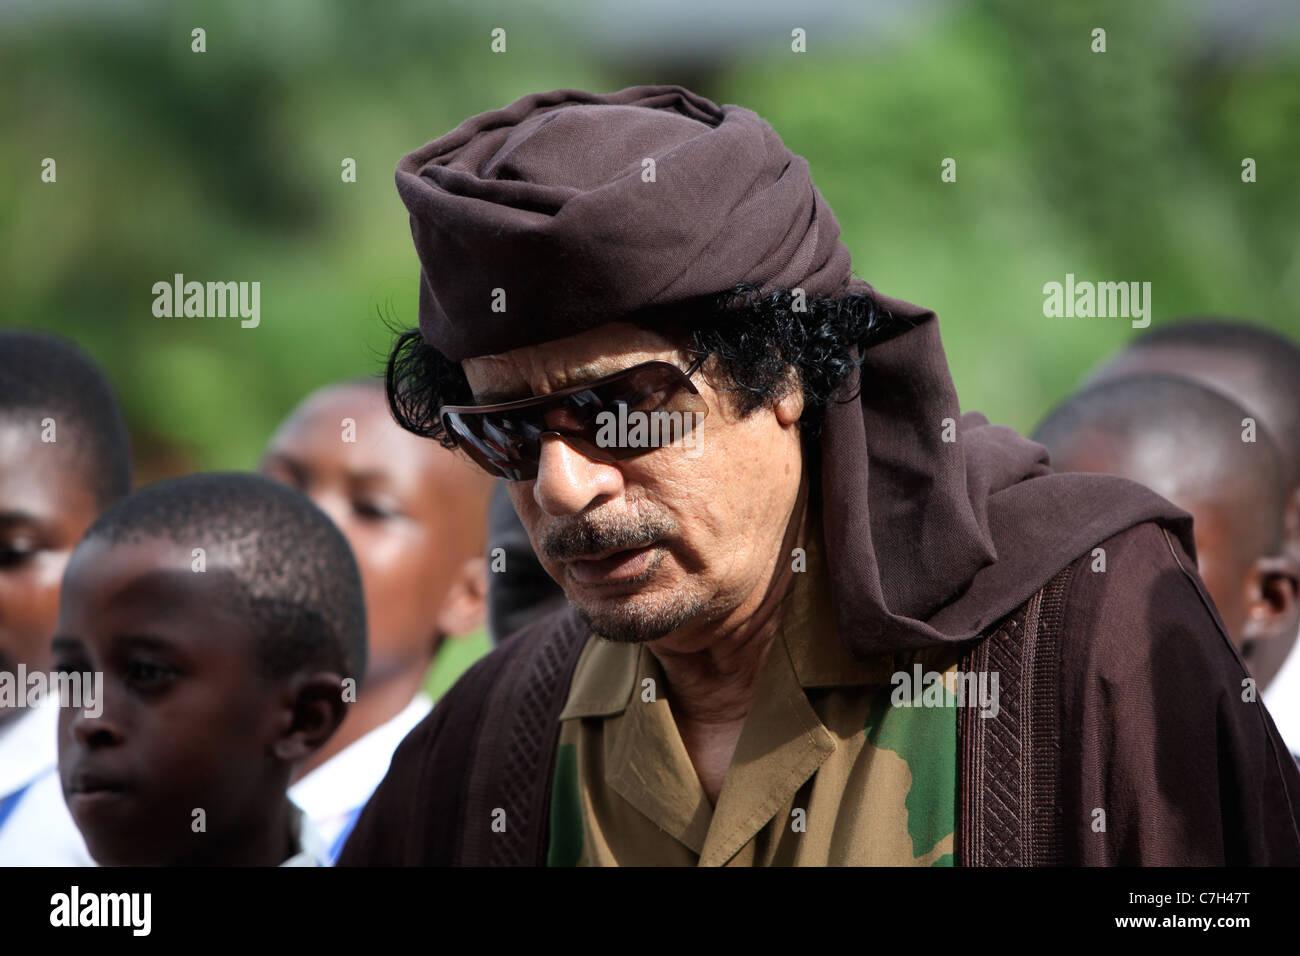 Muammar al-Gaddafi - Stock Image